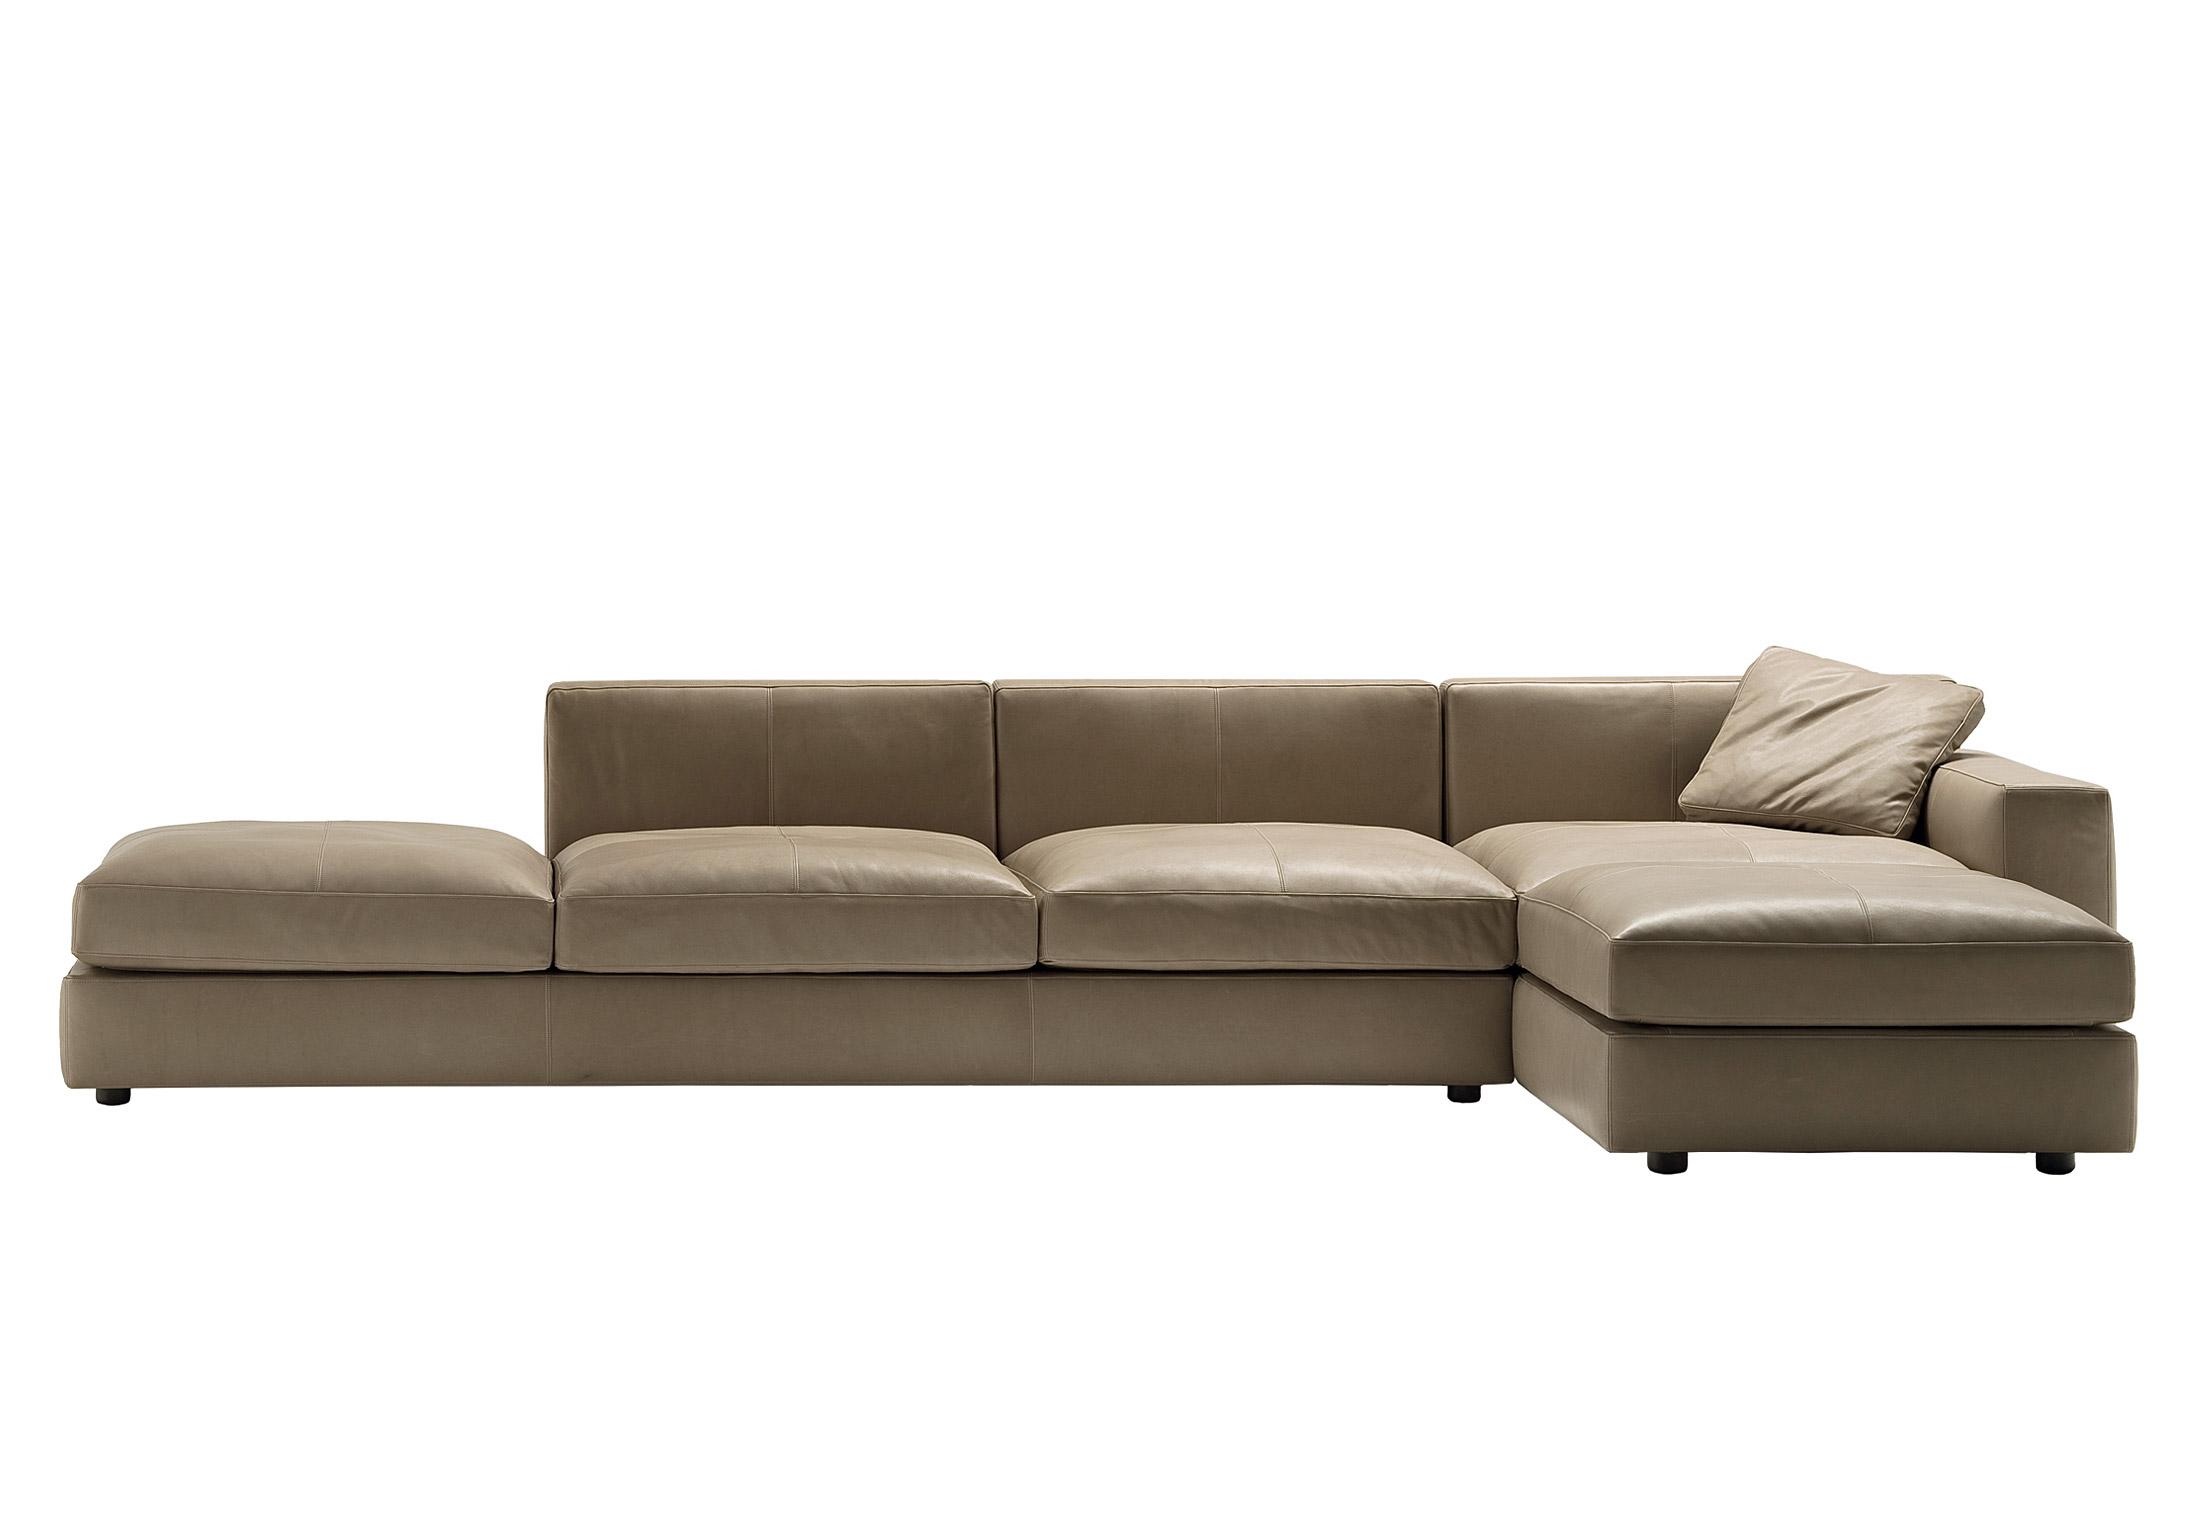 massimosistema group by poltrona frau stylepark. Black Bedroom Furniture Sets. Home Design Ideas